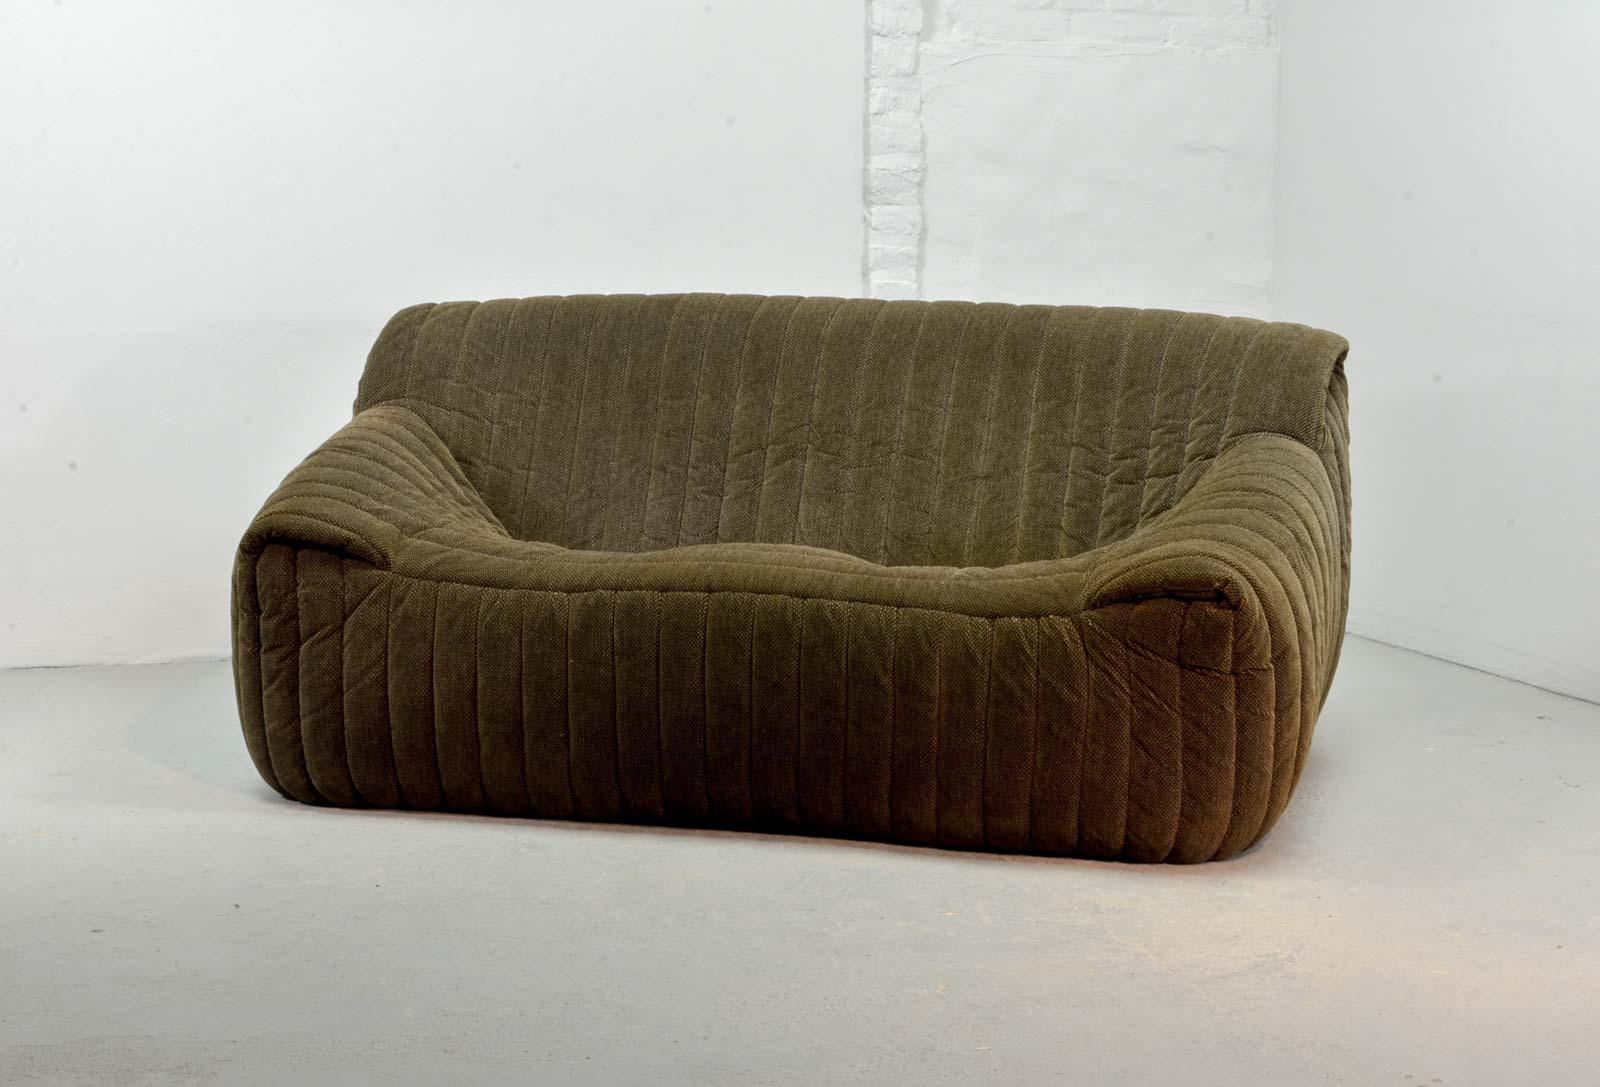 roset ligne sofa beautiful roset ligne sofa with roset. Black Bedroom Furniture Sets. Home Design Ideas